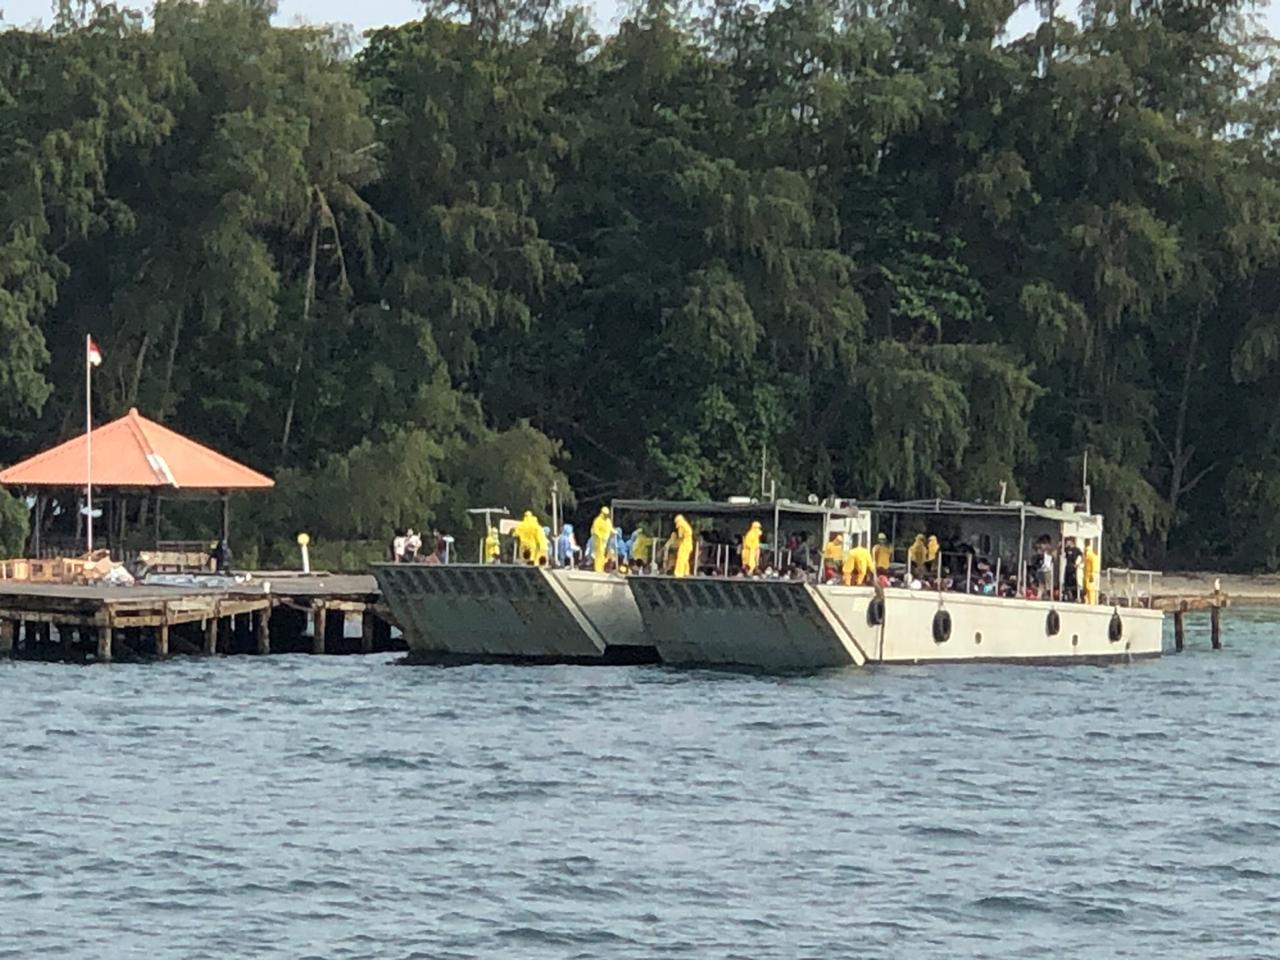 Evakuasi 188 WNI di Kapal Pesiar World Dream Dibawa ke Pulau Sebaru. (foto: wartabhineka)